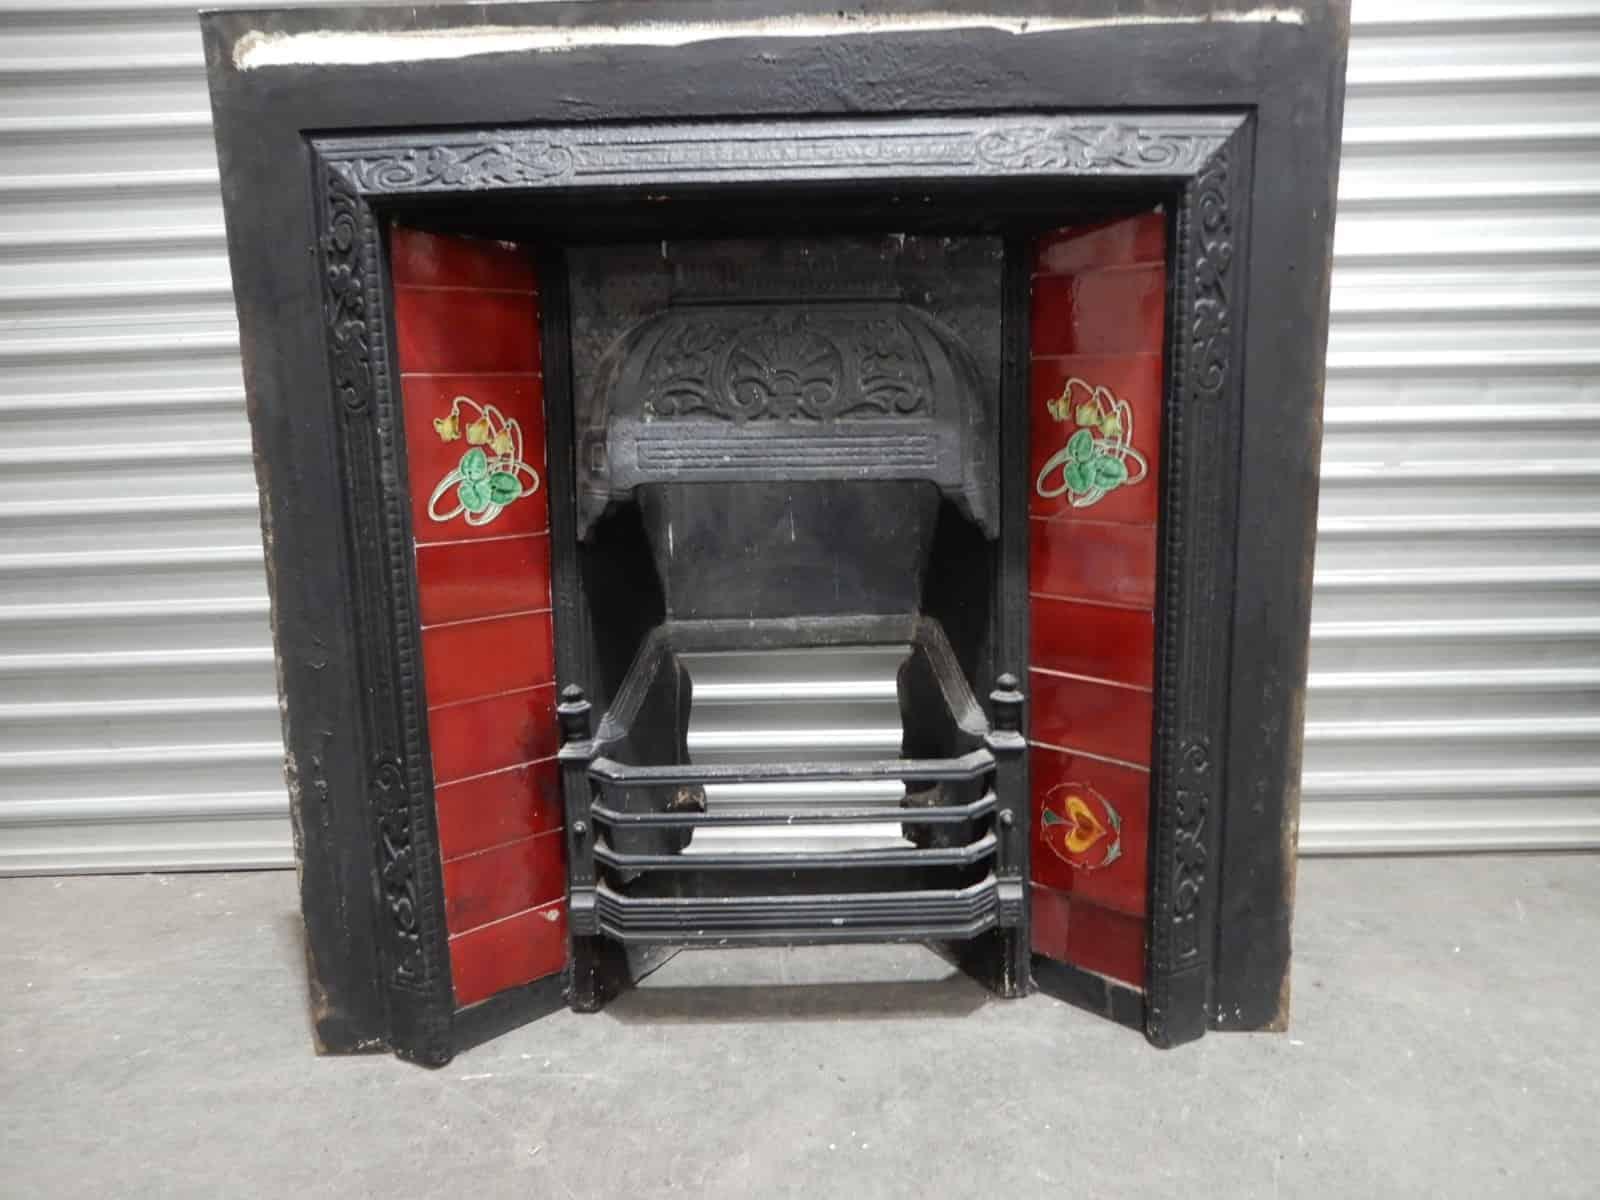 Fireplace Cast Iron Red Tiles Feature Hood 8g